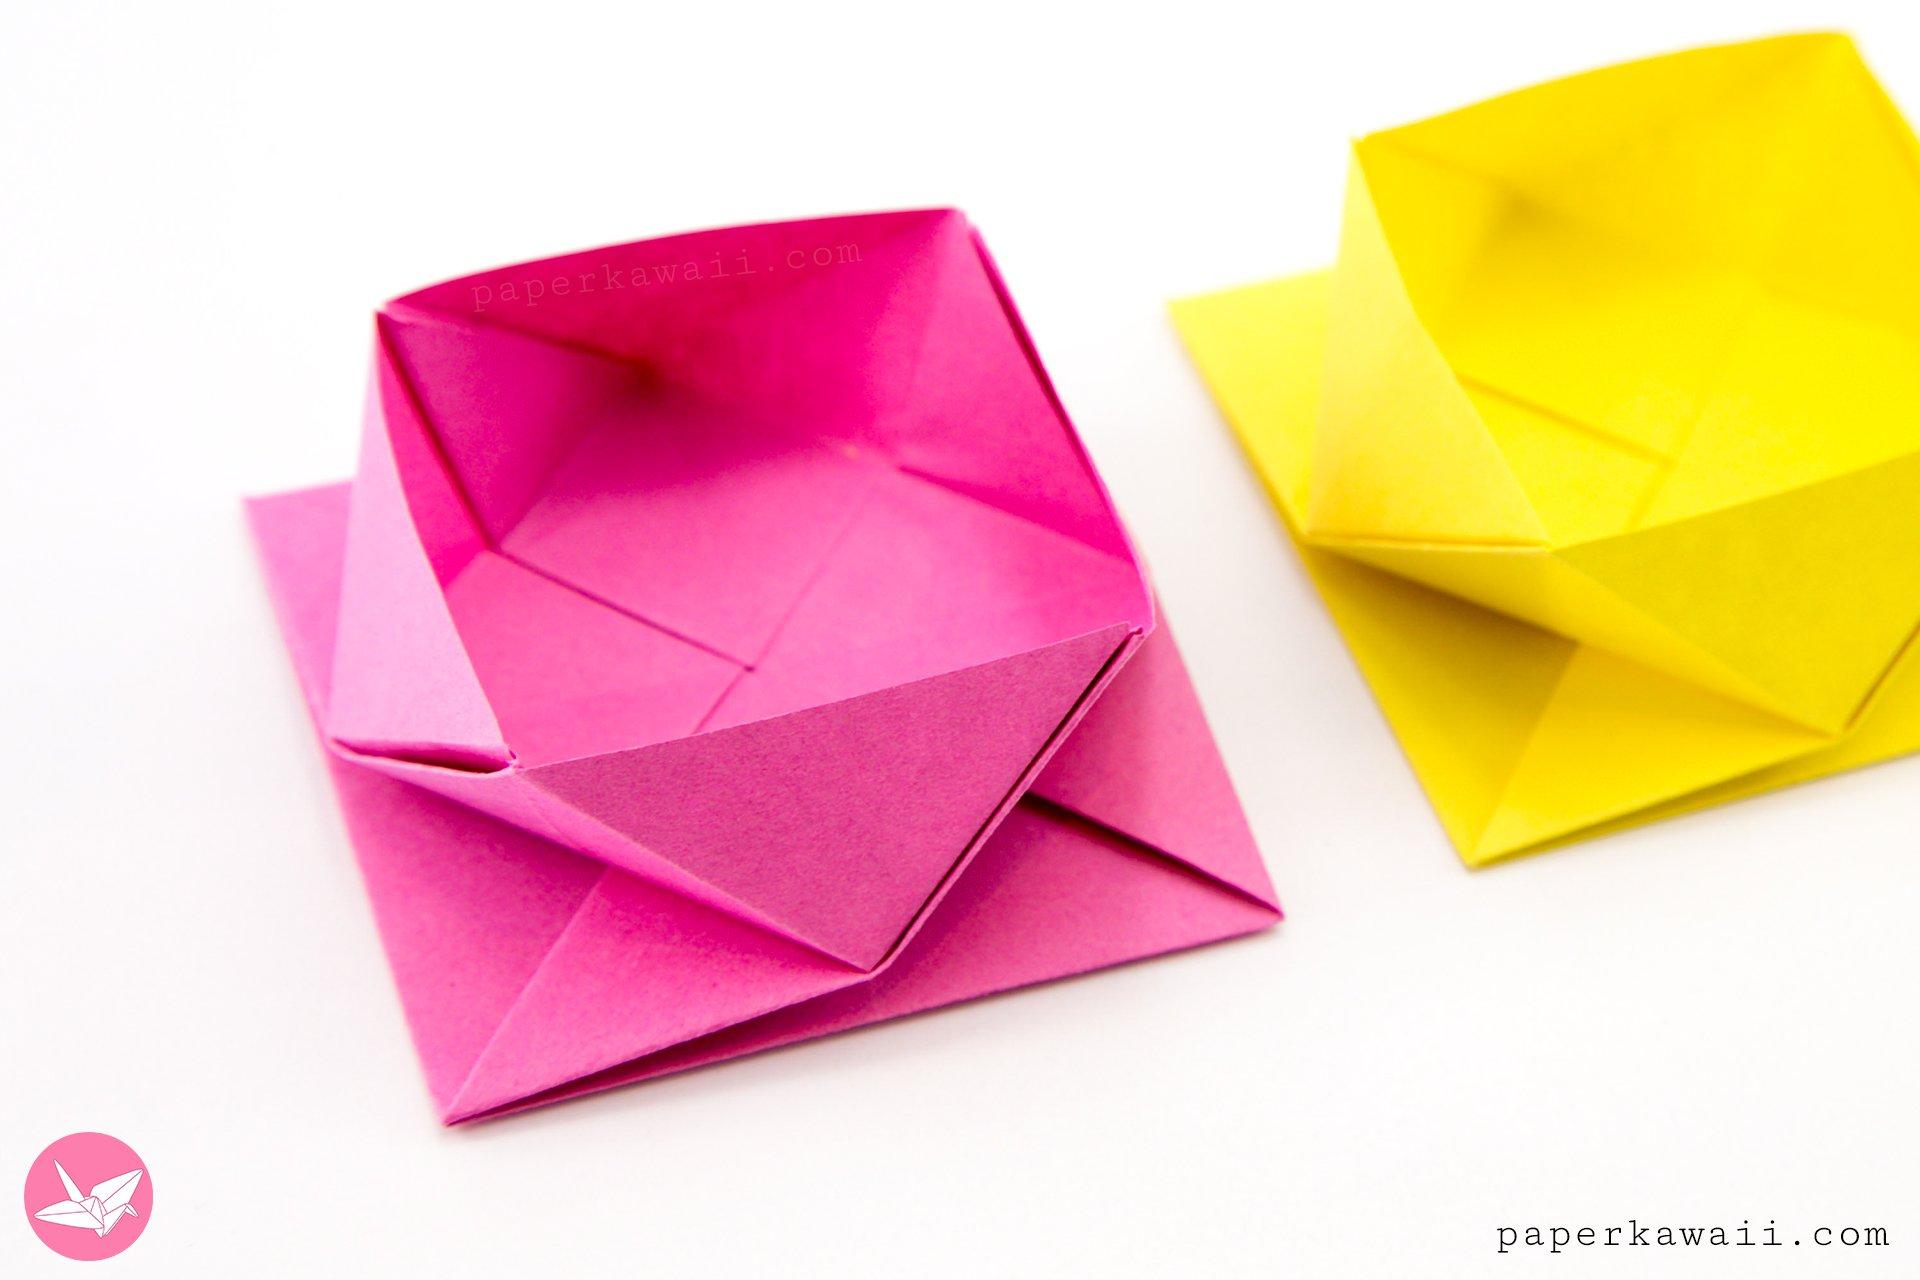 Origami Square Twist Box Tutorial via @paper_kawaii